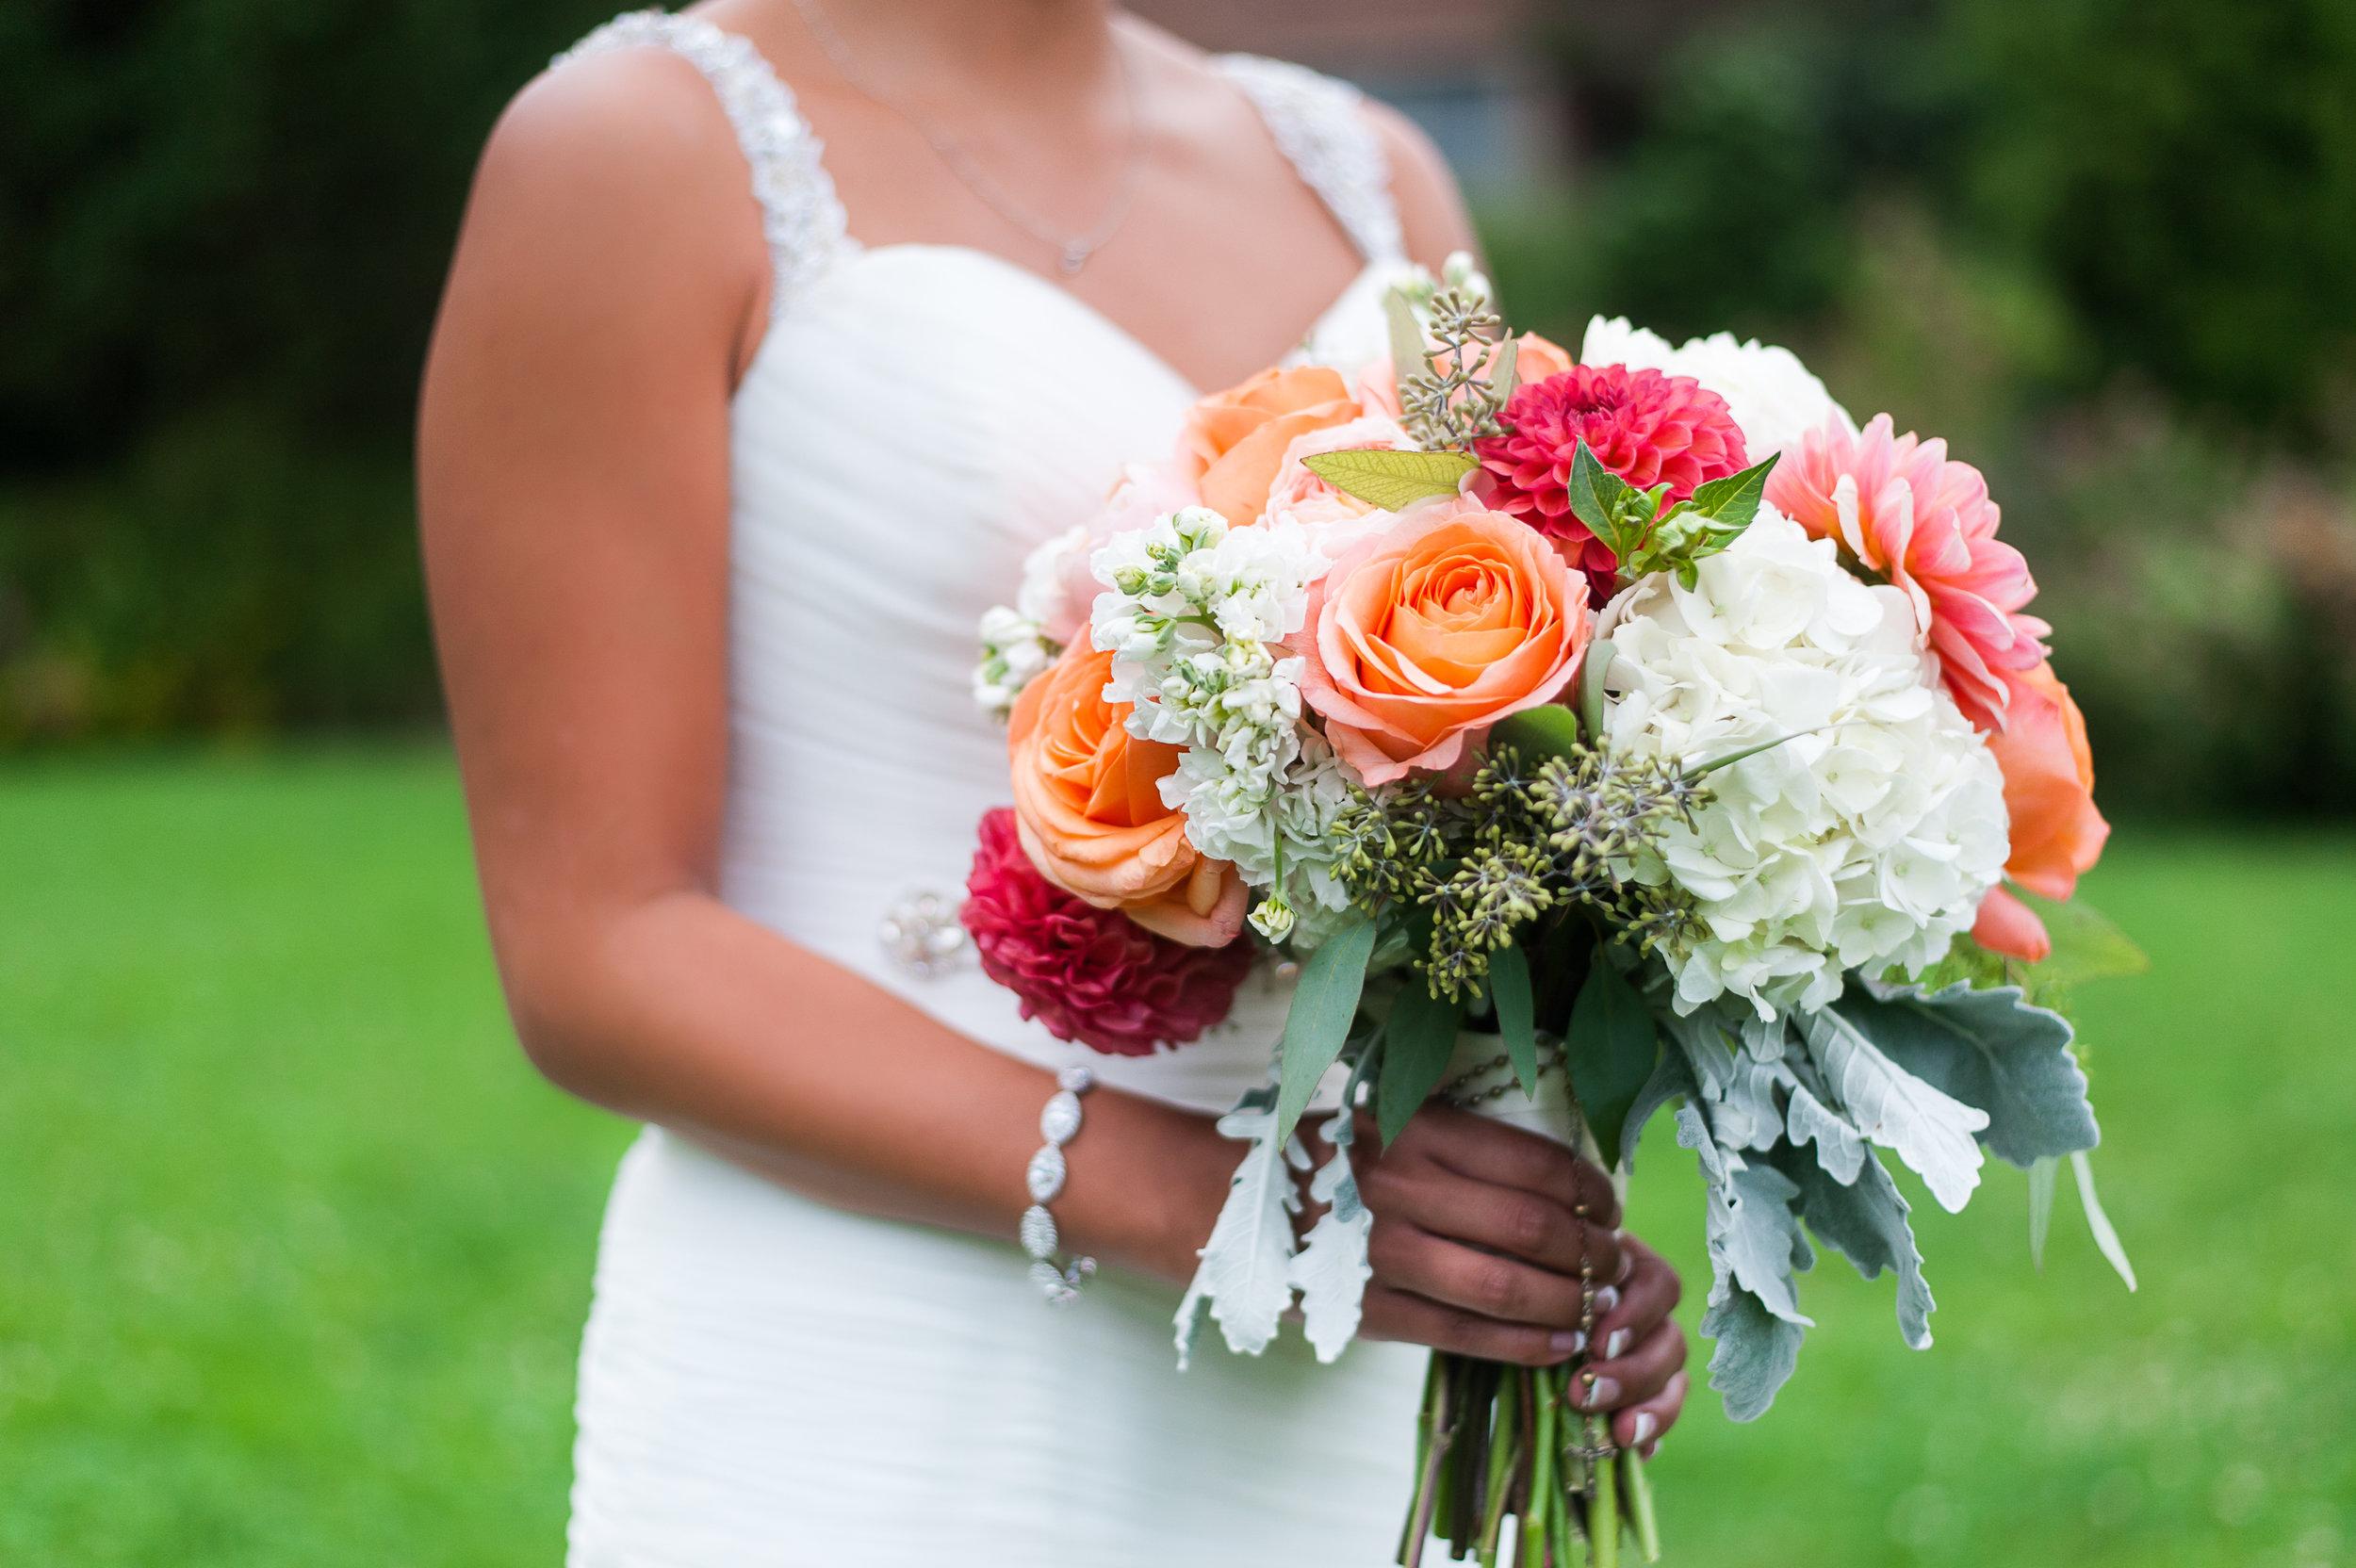 DJ-wedding-Van-Wyhe-Photography-250.jpg